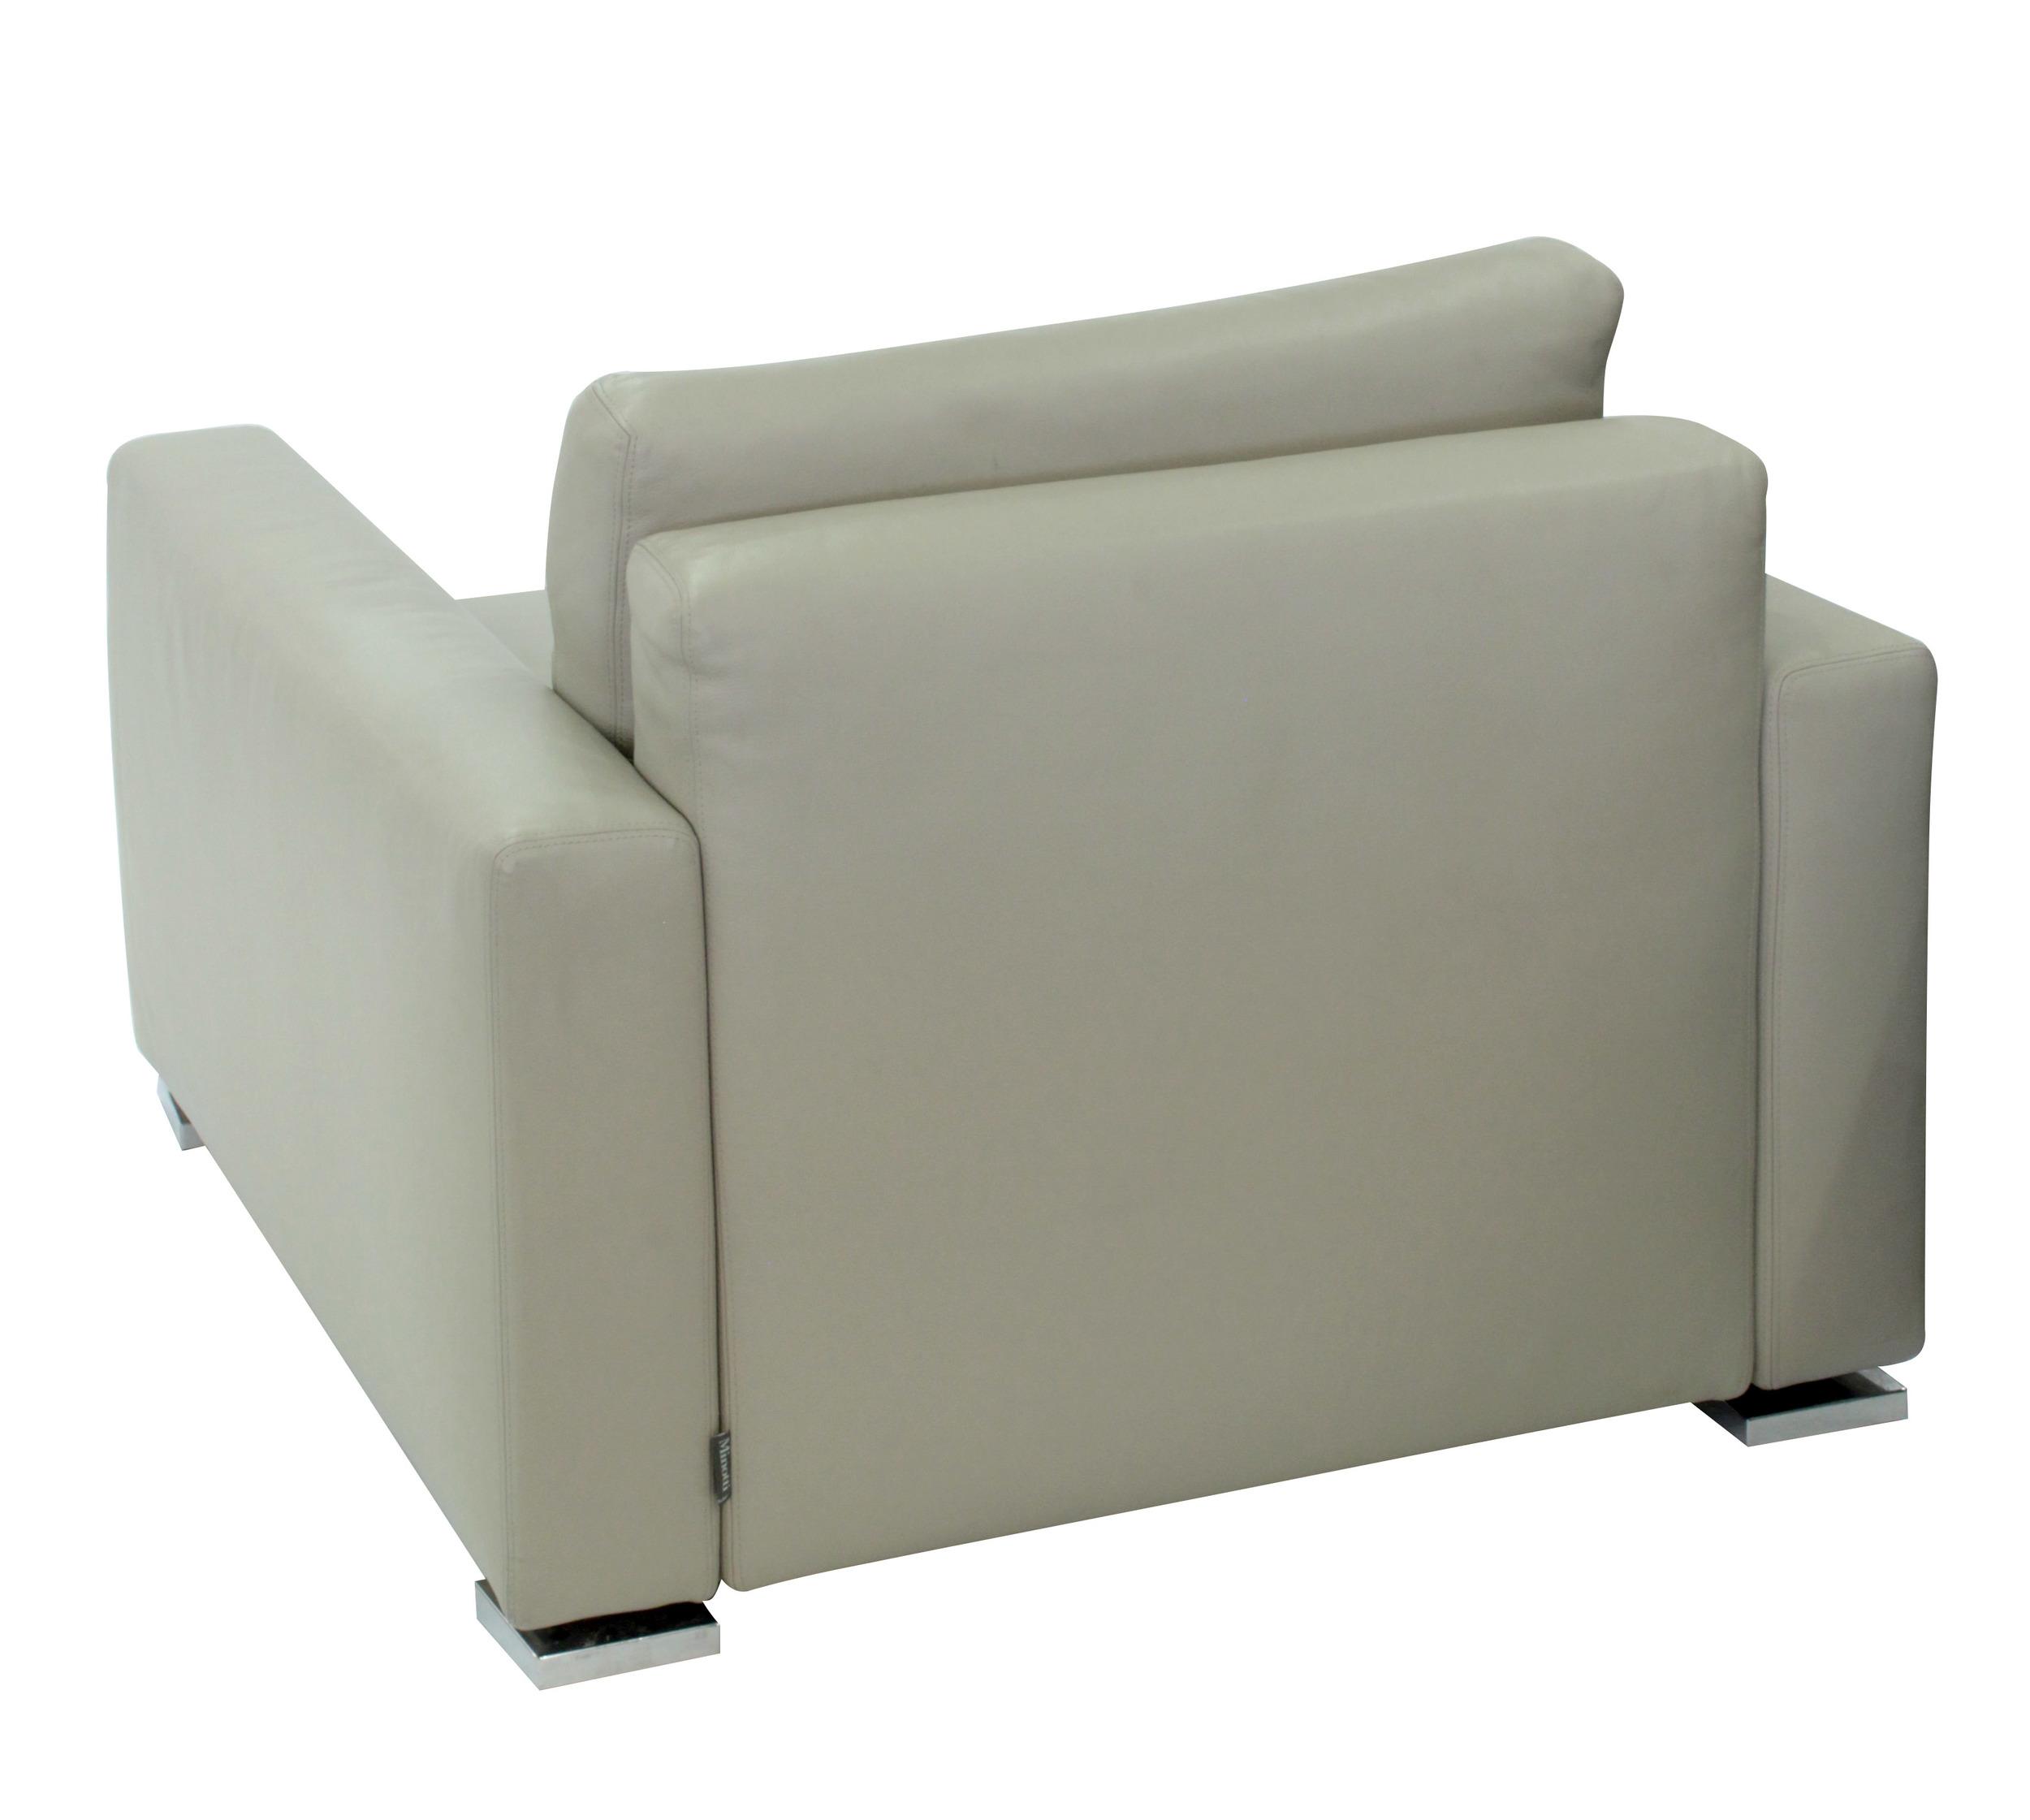 Minotti 65 cleanline lthr clubchairs54 detail3 hires.JPG